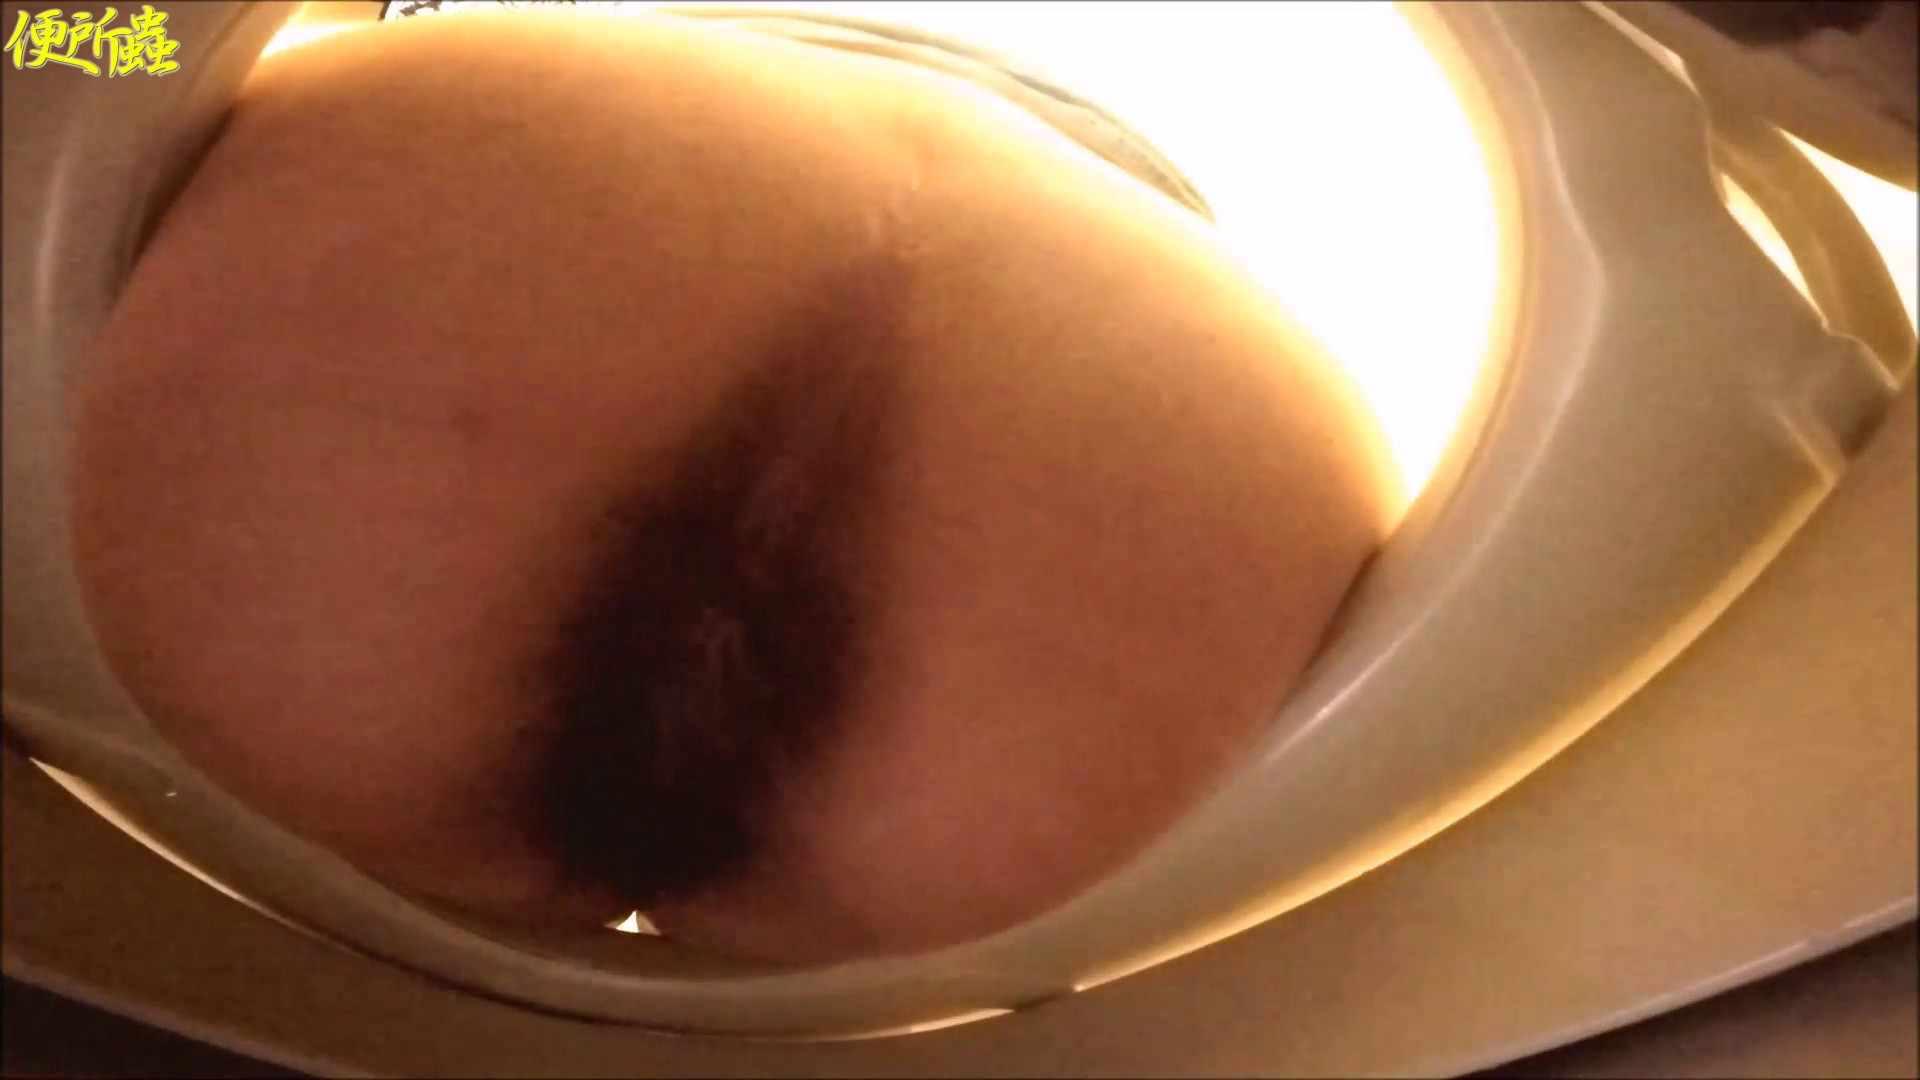 vol.13 便所蟲さんのリターン~寺子屋洗面所盗撮~ 盛合せ セックス画像 92画像 76